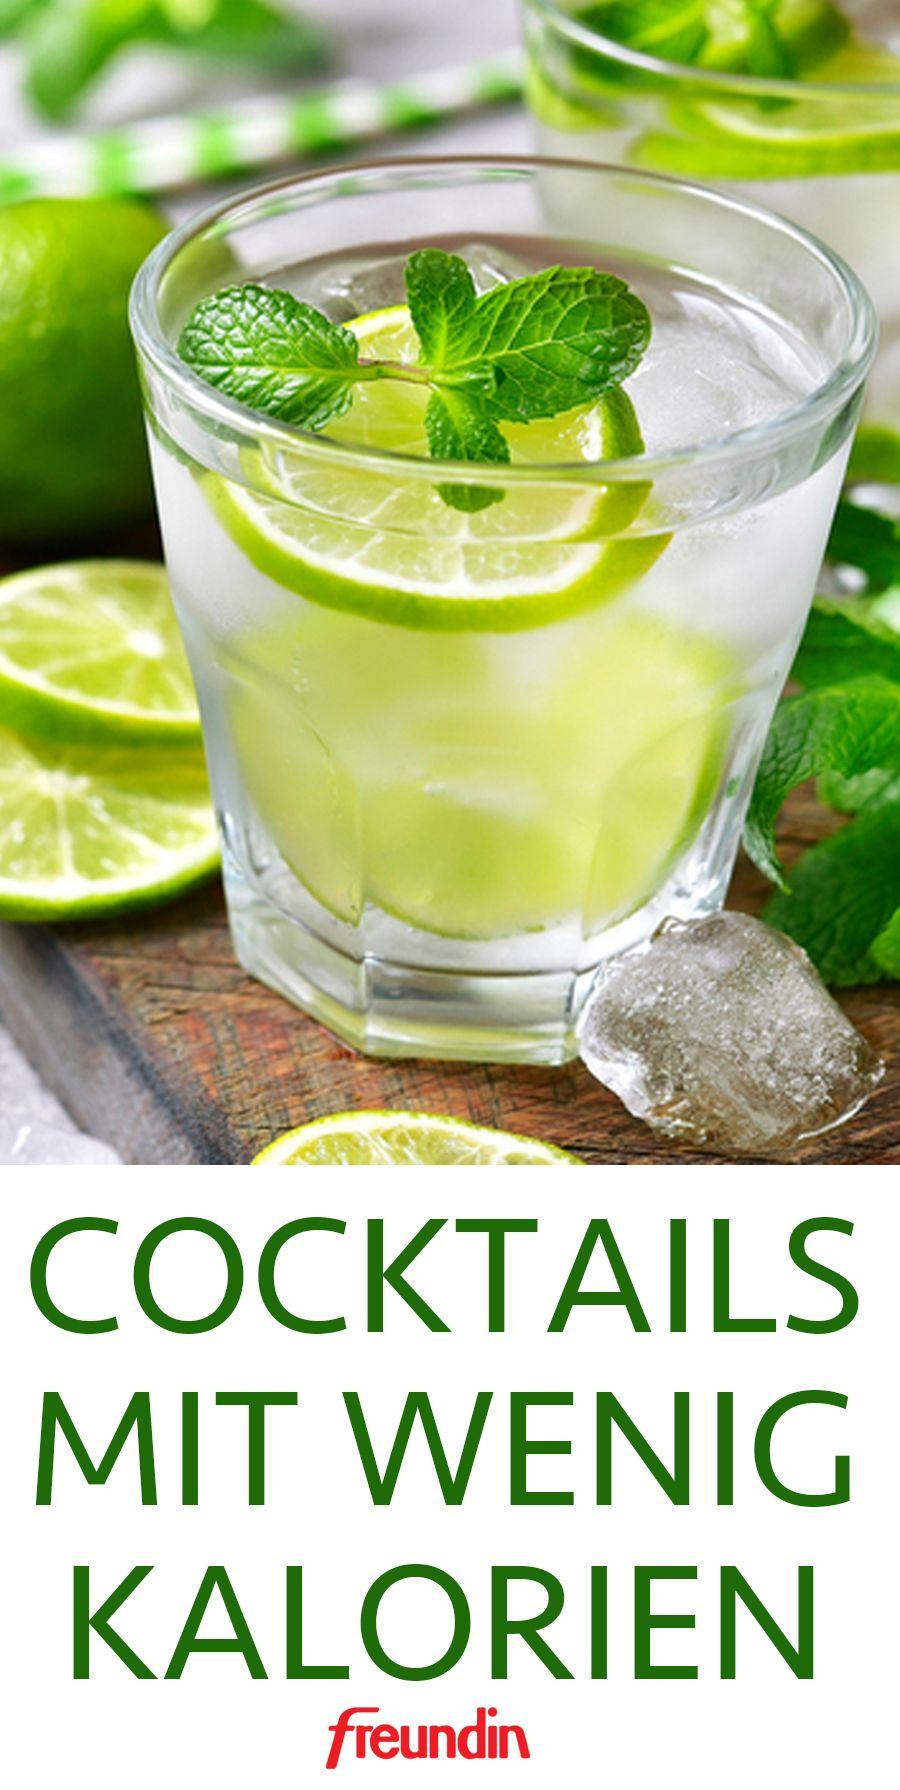 Cocktails Mit Wenig Kalorien Freundin De Wenig Kalorien Cocktails Rezepte Wenig Kalorien